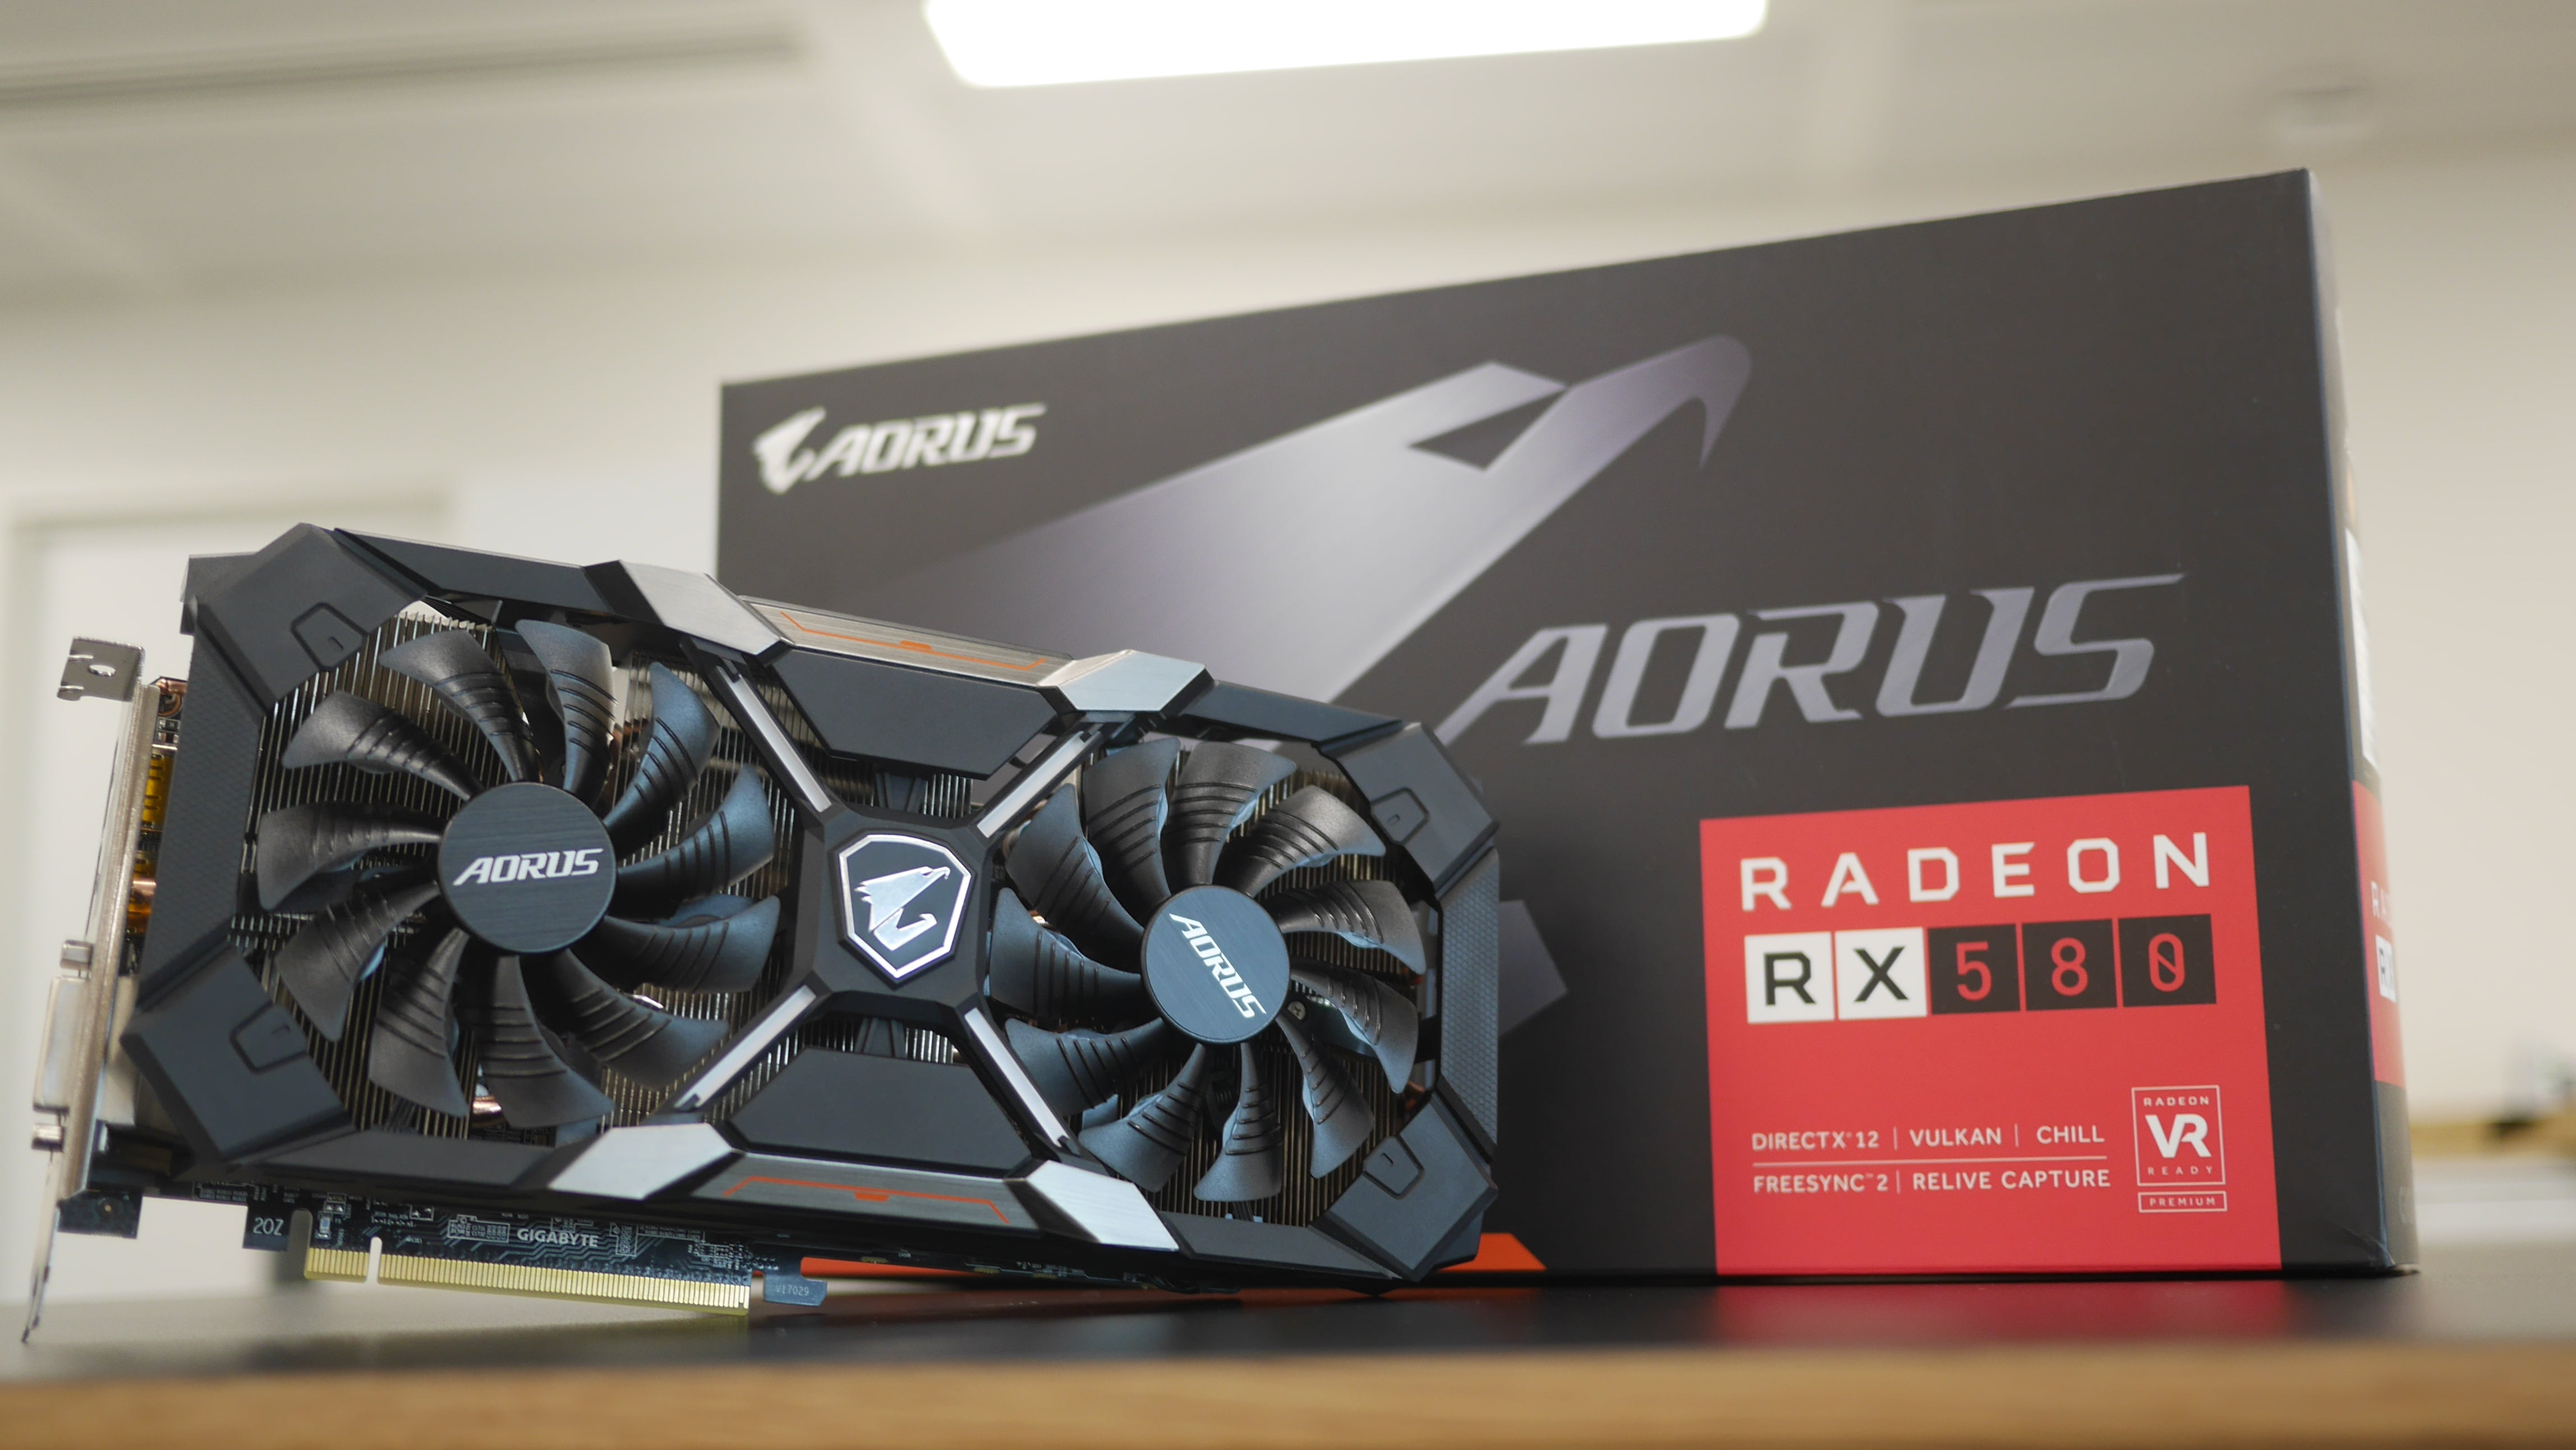 Nvidia geforce 570 gtx gigabyte